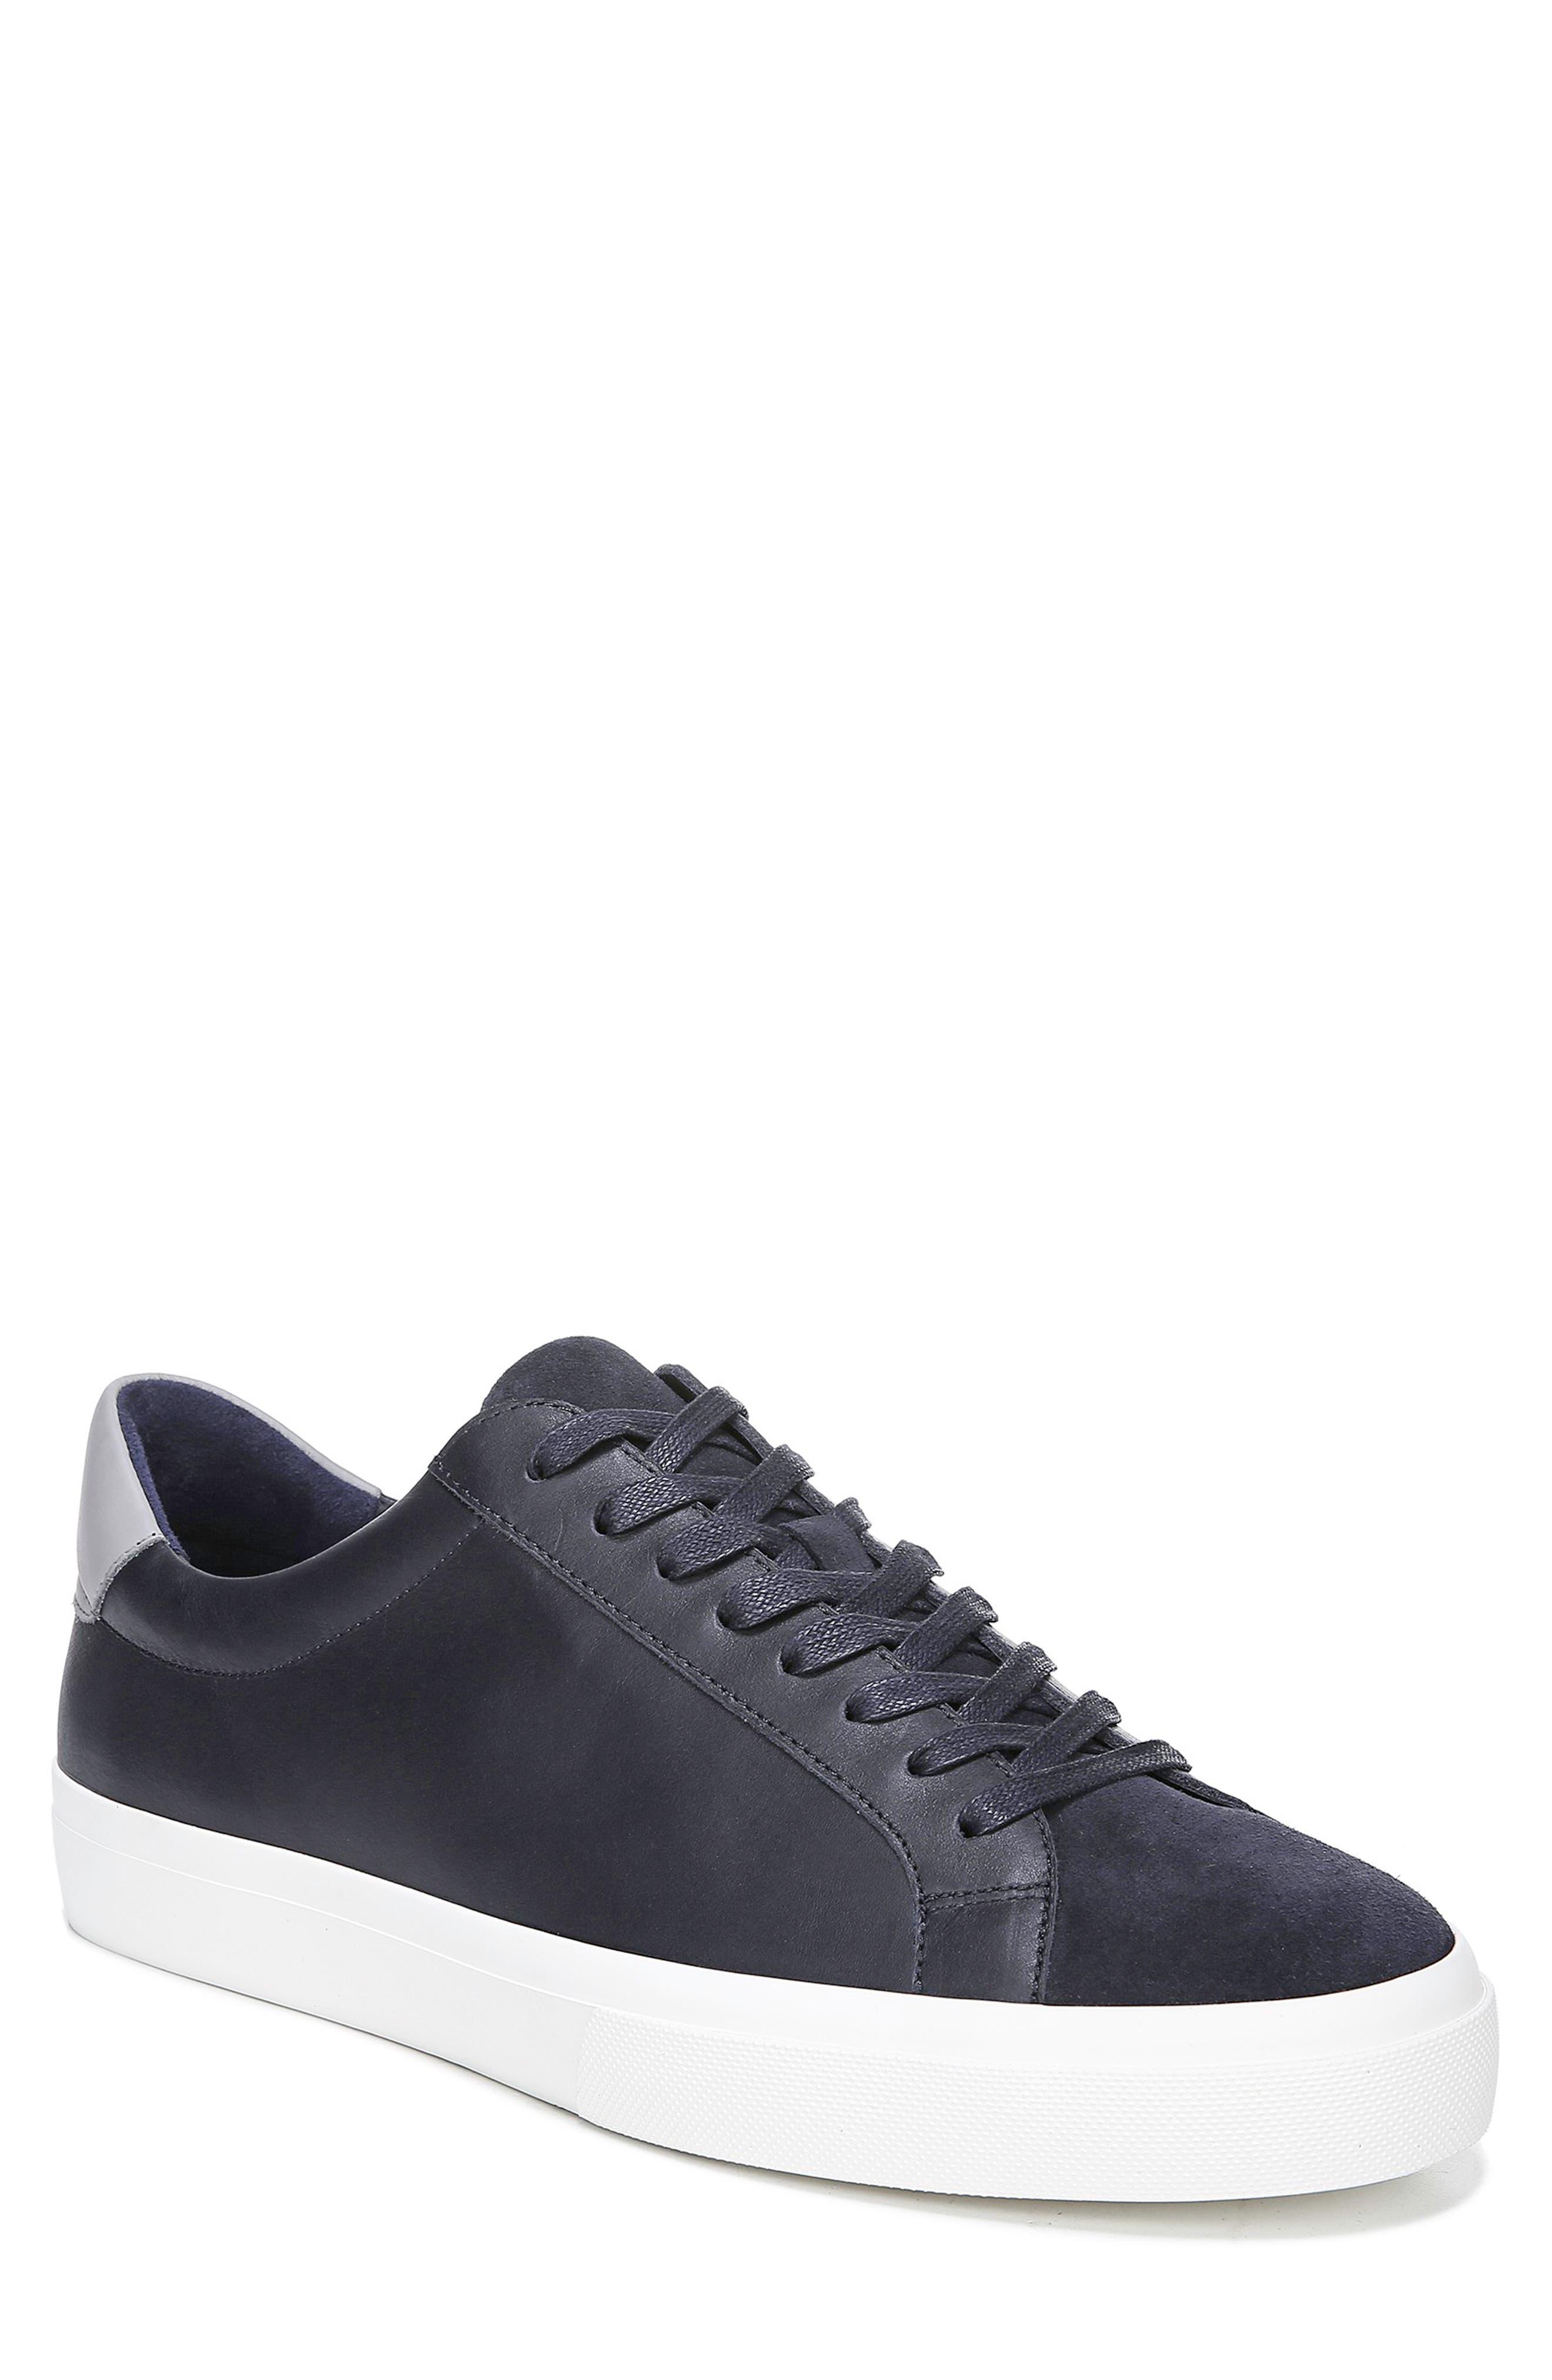 Men's Vince Shoes | Nordstrom